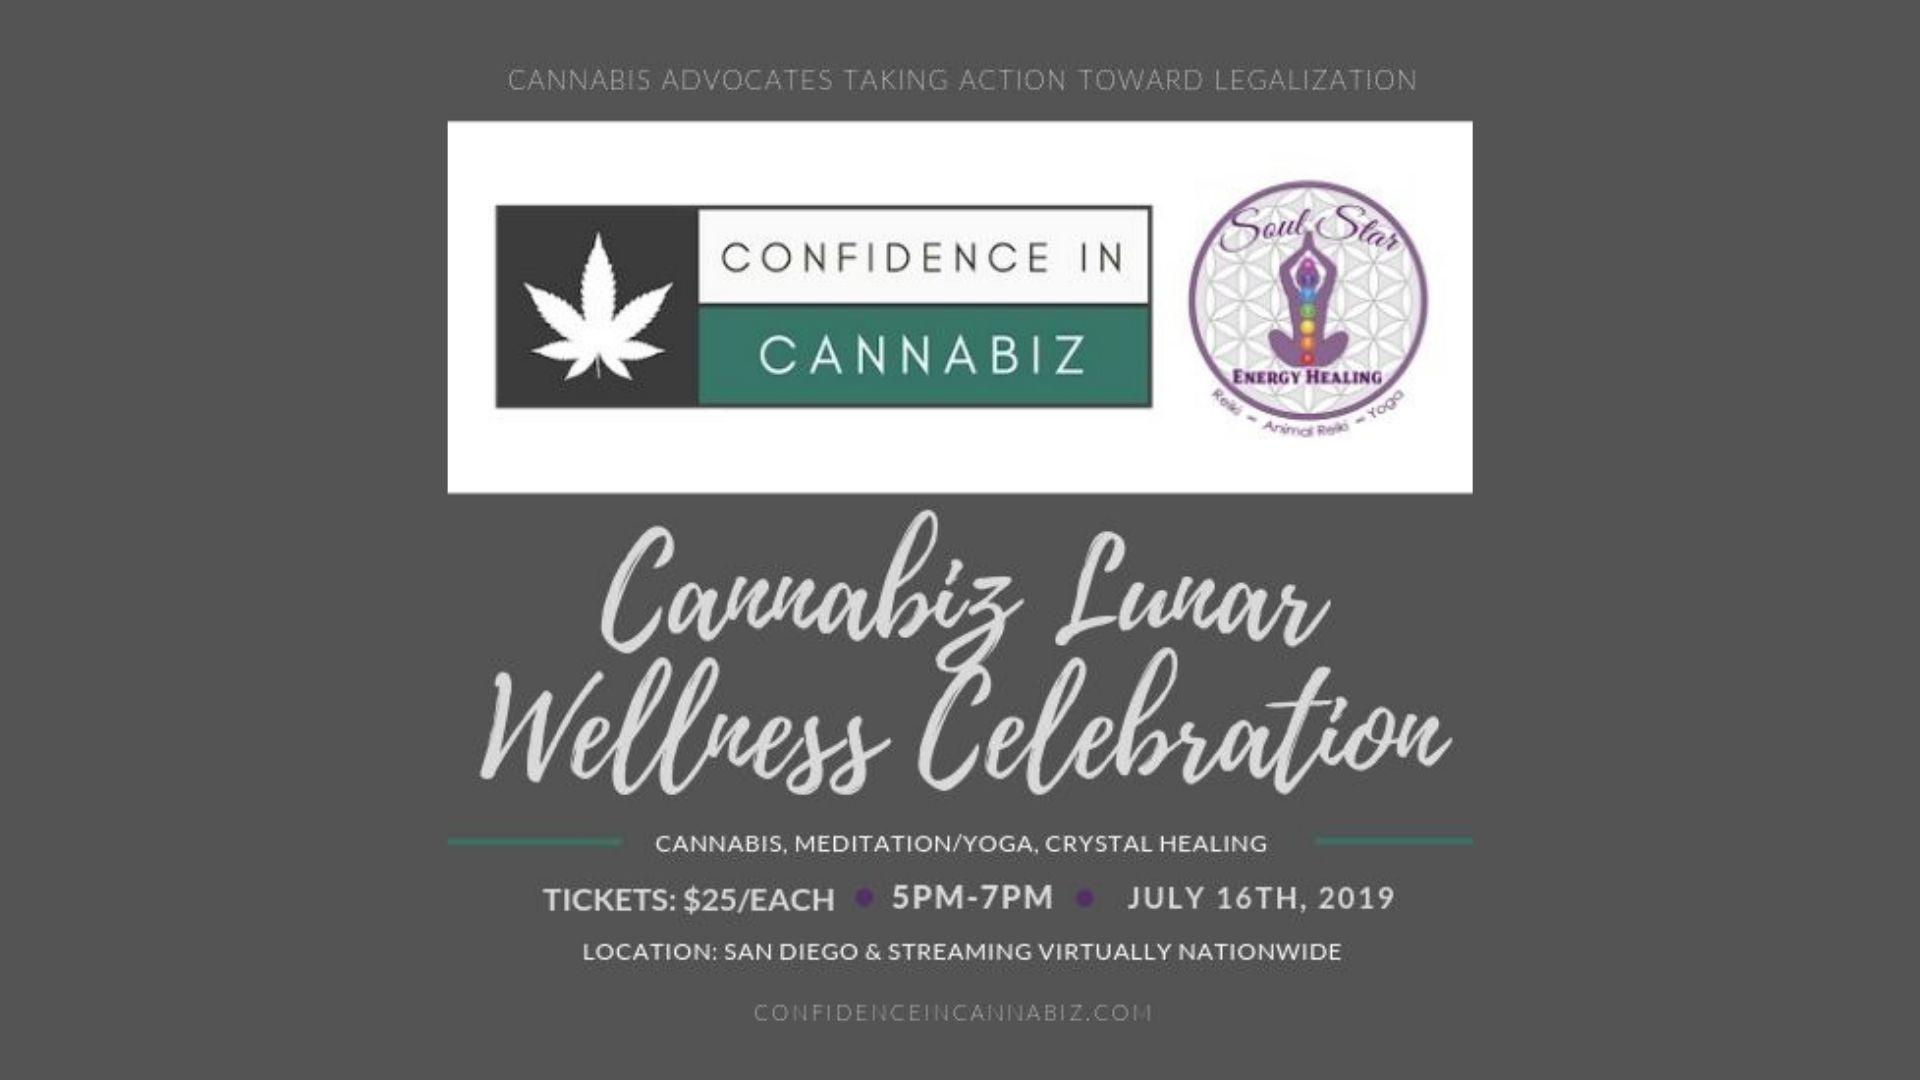 Cannabiz Lunar Wellness Celebration